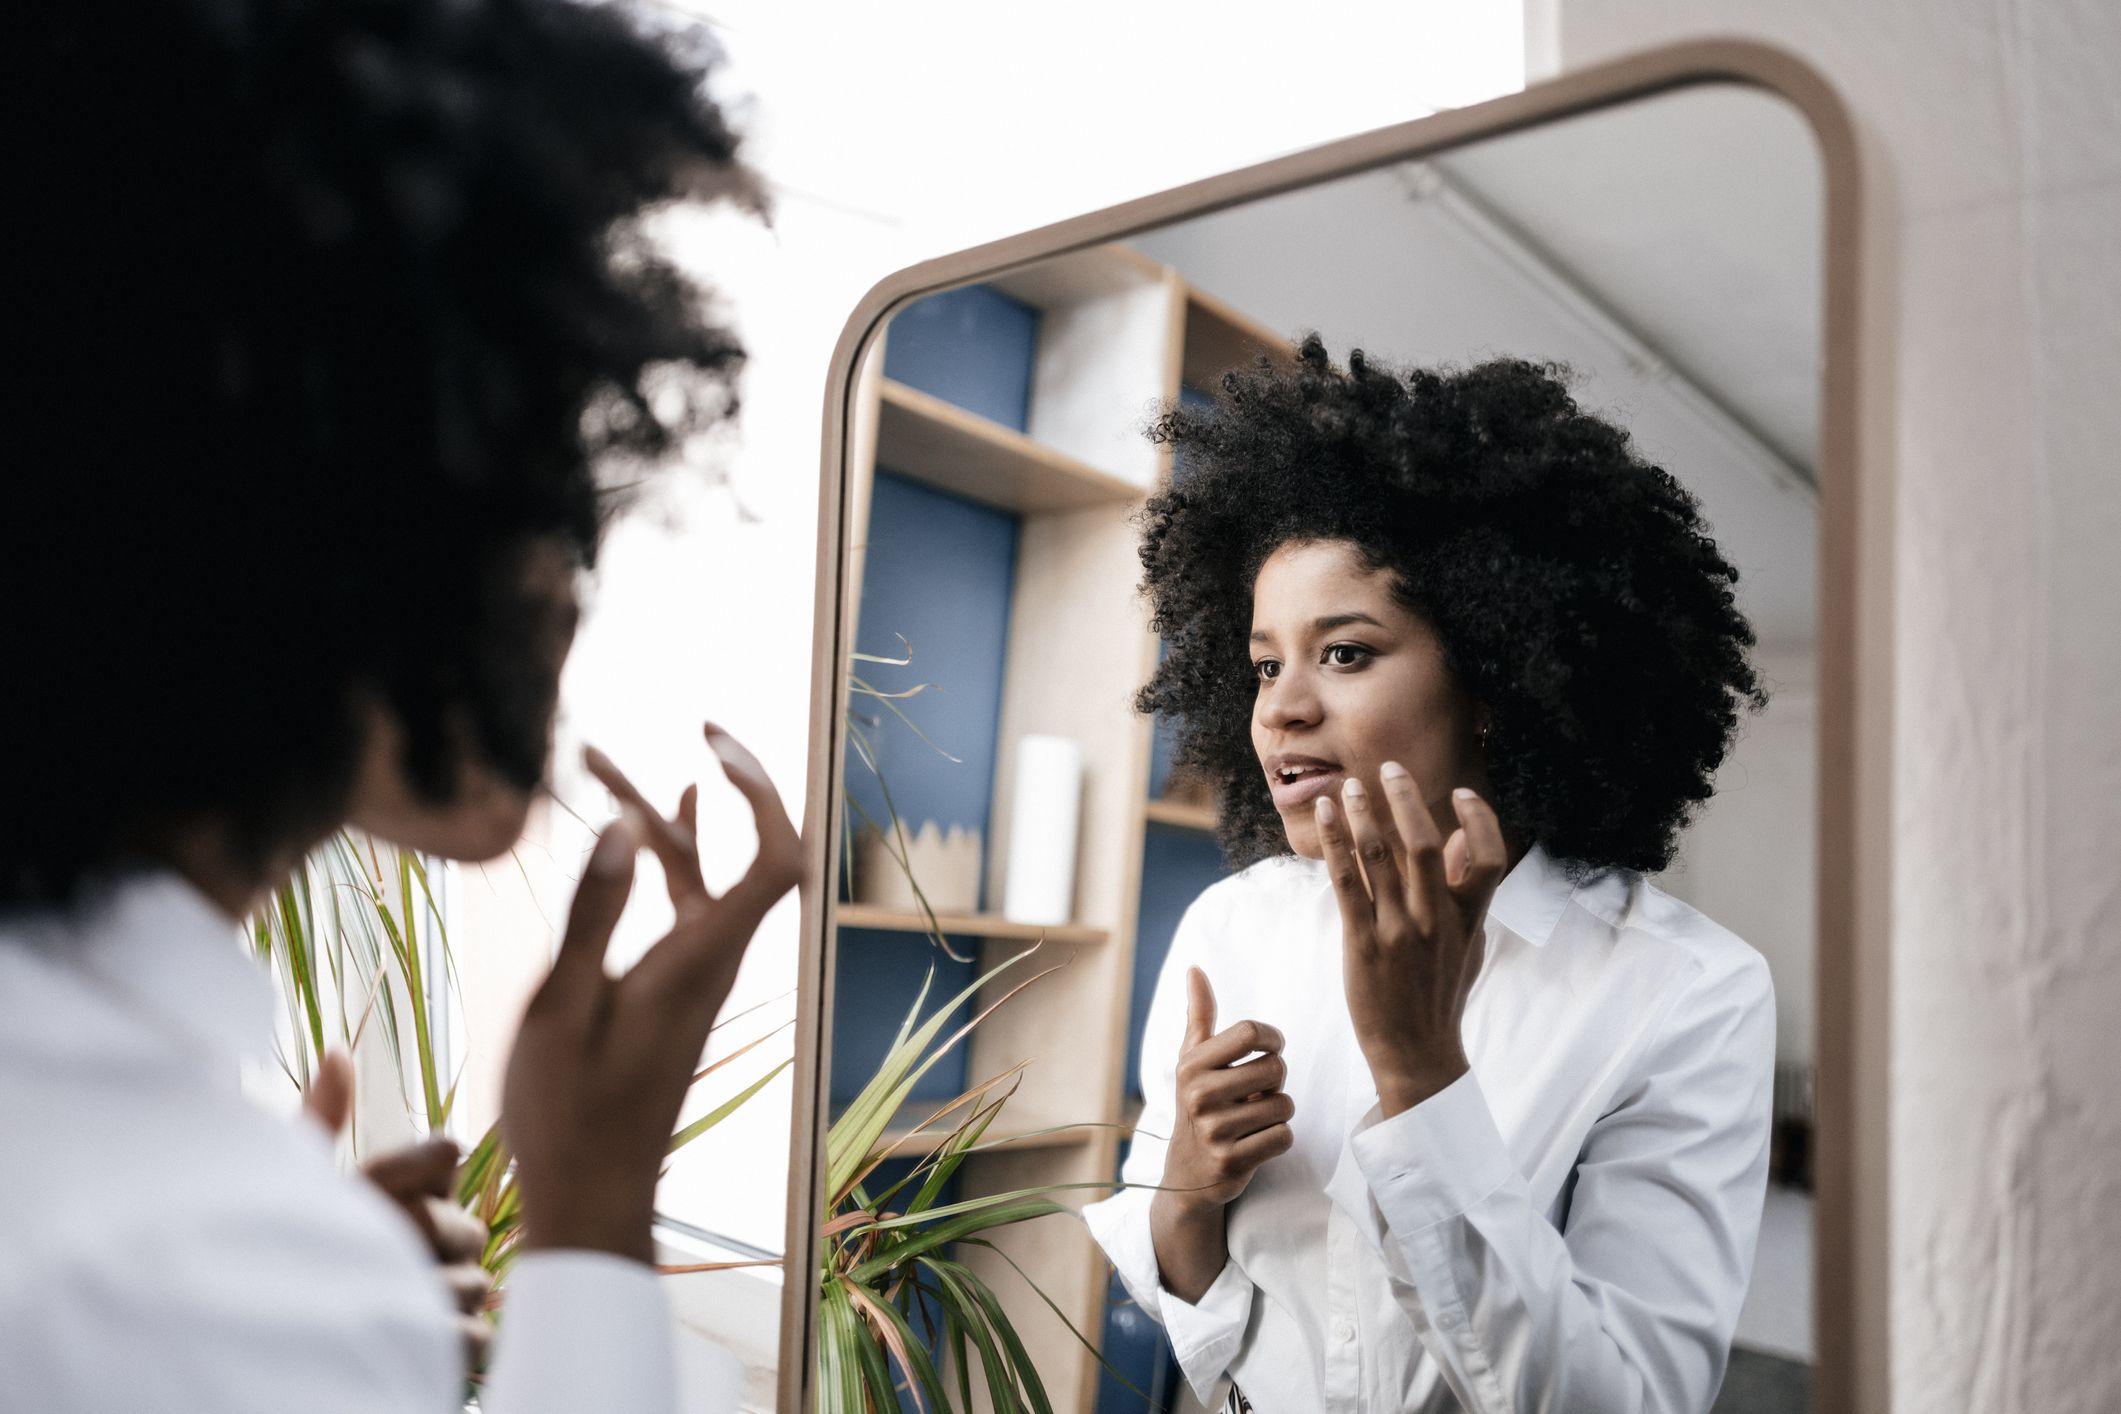 15 Best Foundations For Dark Skin Tones 2021